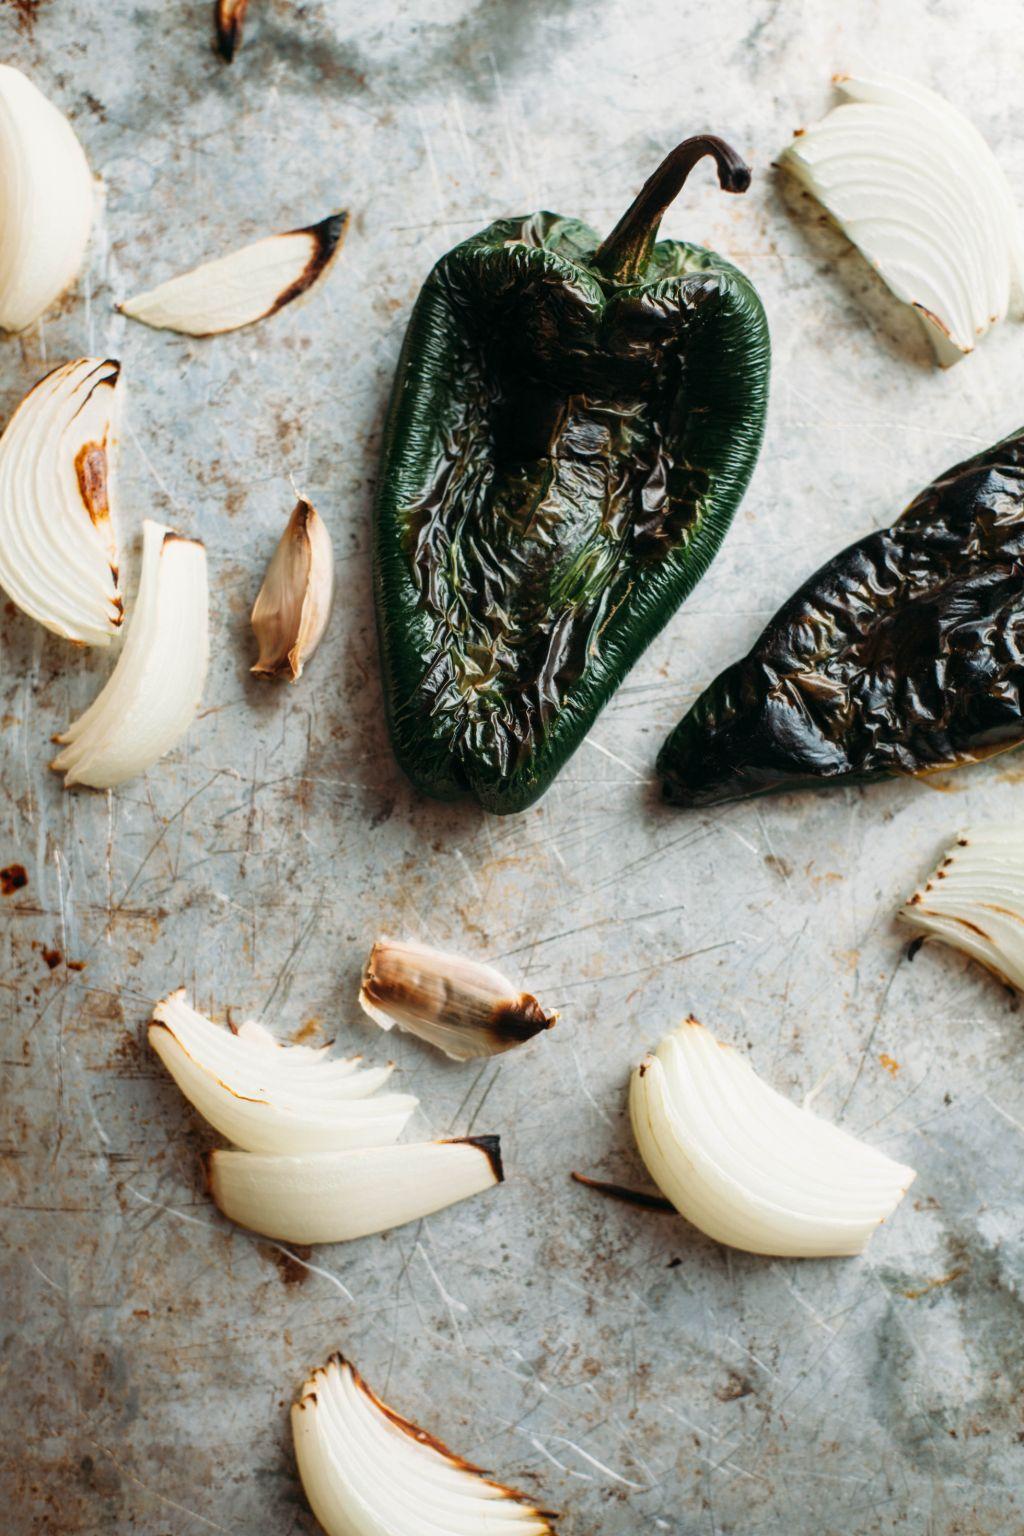 Fried Mushroom Tacos with Roasted Poblano Sauce - Tastemaker Blog